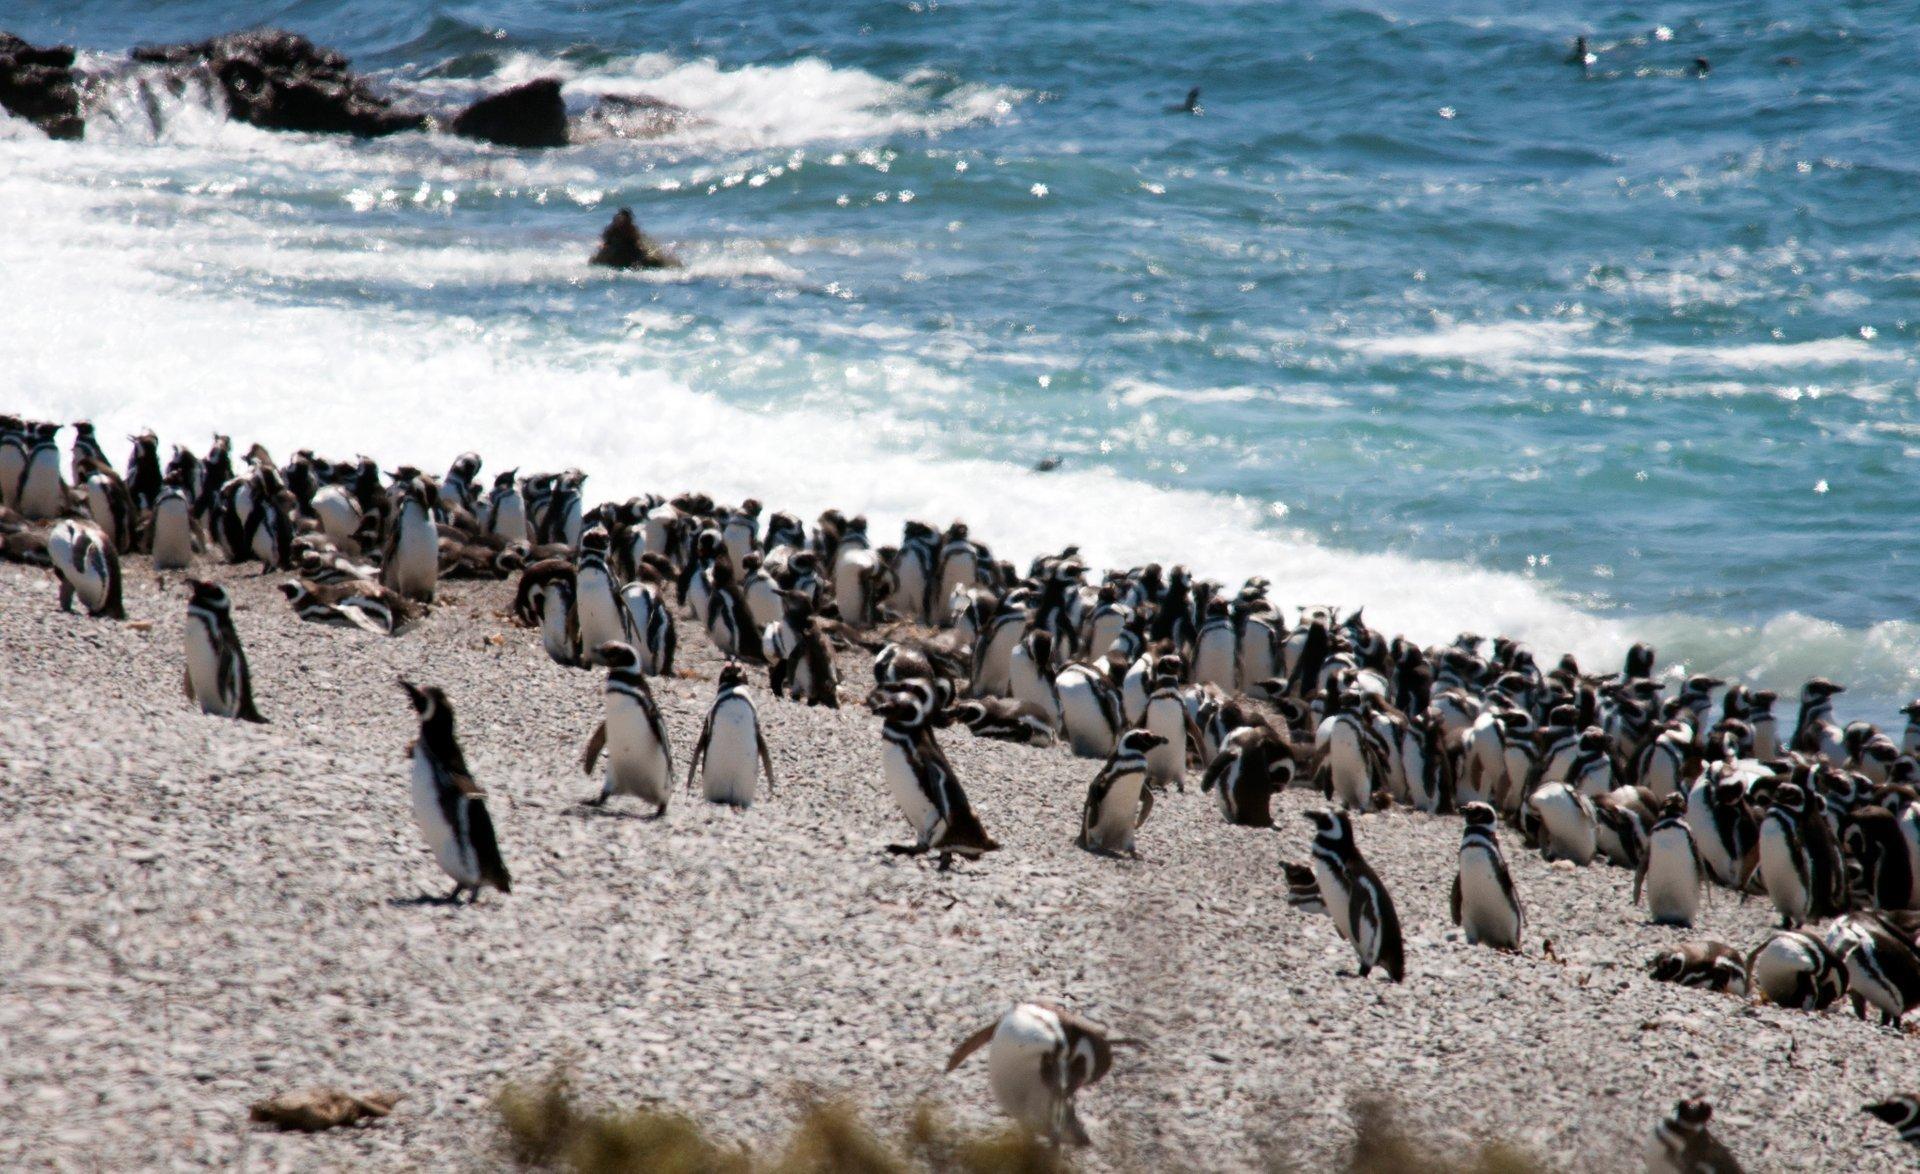 Penguins in Argentina 2019 - Best Time